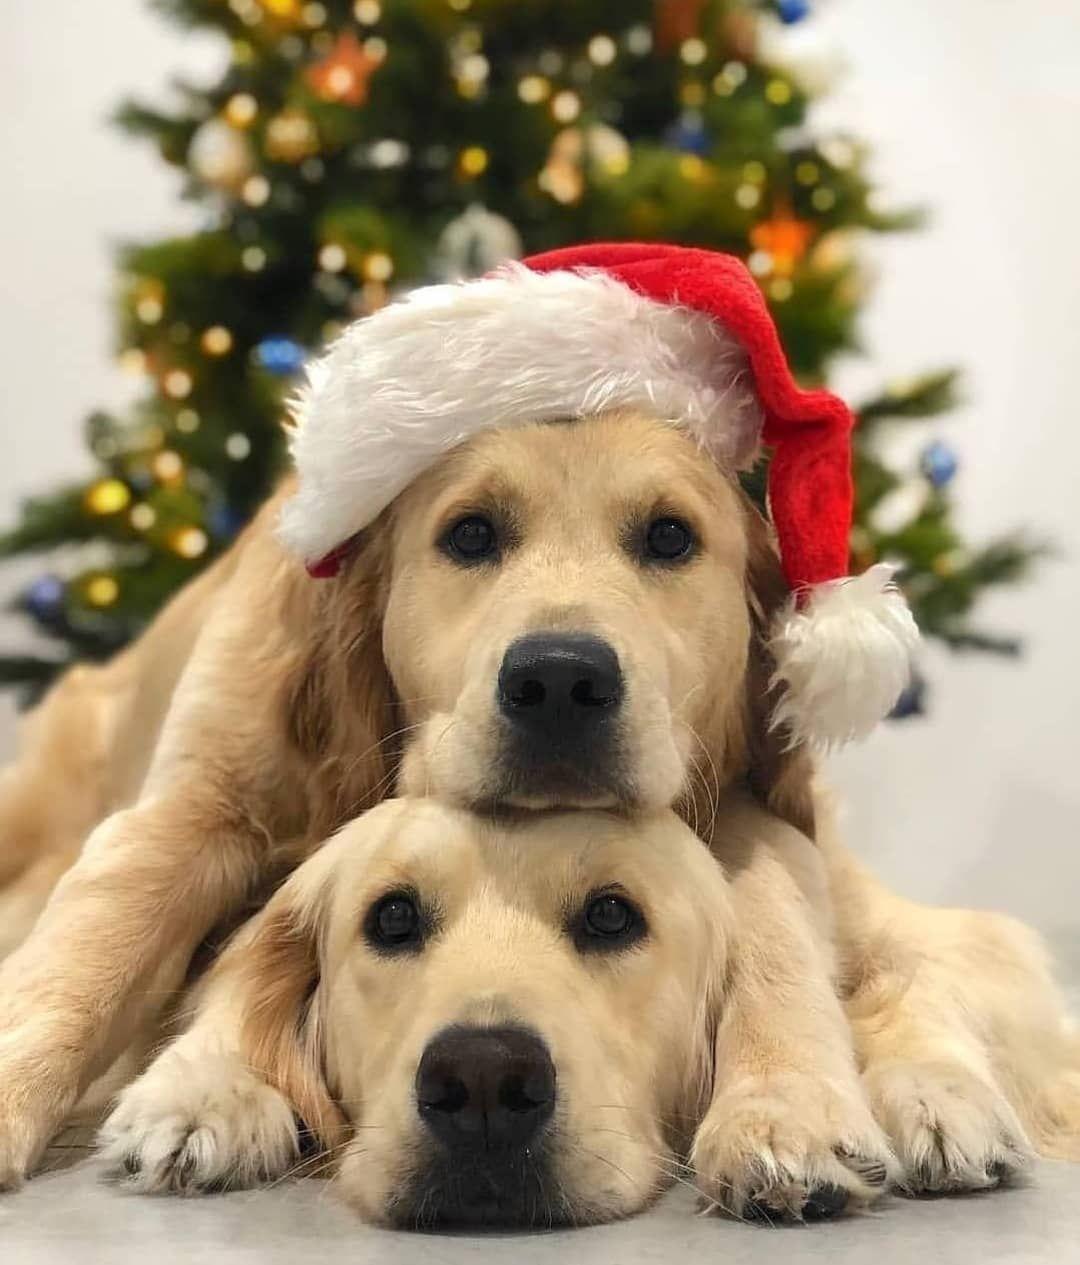 Pin By לירי שירה בצלאל On חיות חמודות ממש I Love Dogs Dog